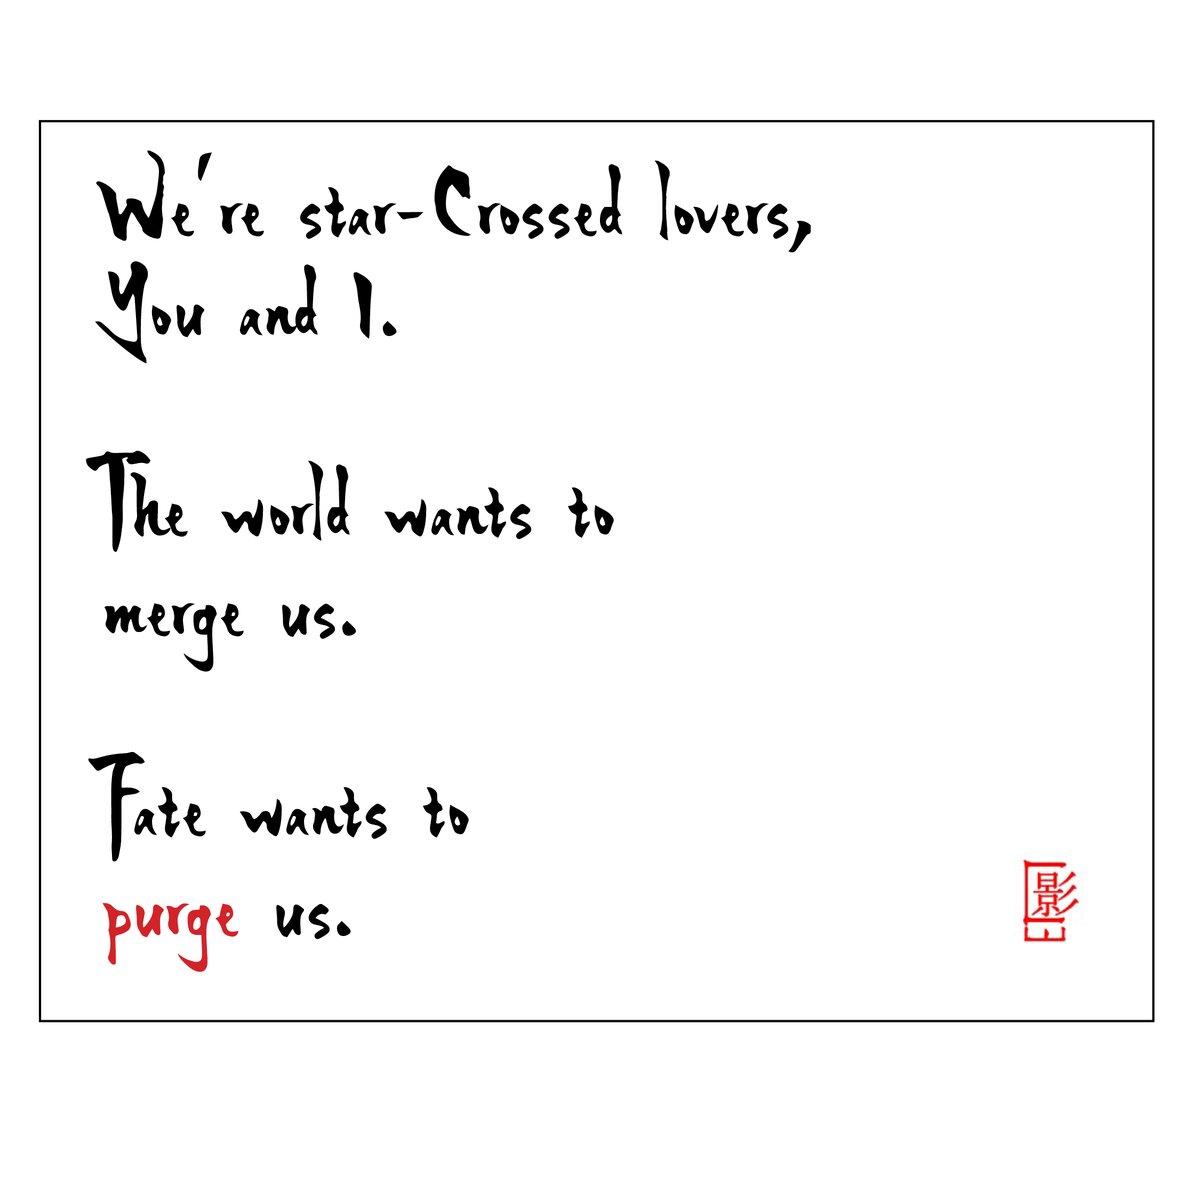 Practico and Emotionette! . #micropoetry #love #RomeoAndJuliet #Reality #microfiction #poetry #poem #writers #amwritingpic.twitter.com/JG6UwjifXW